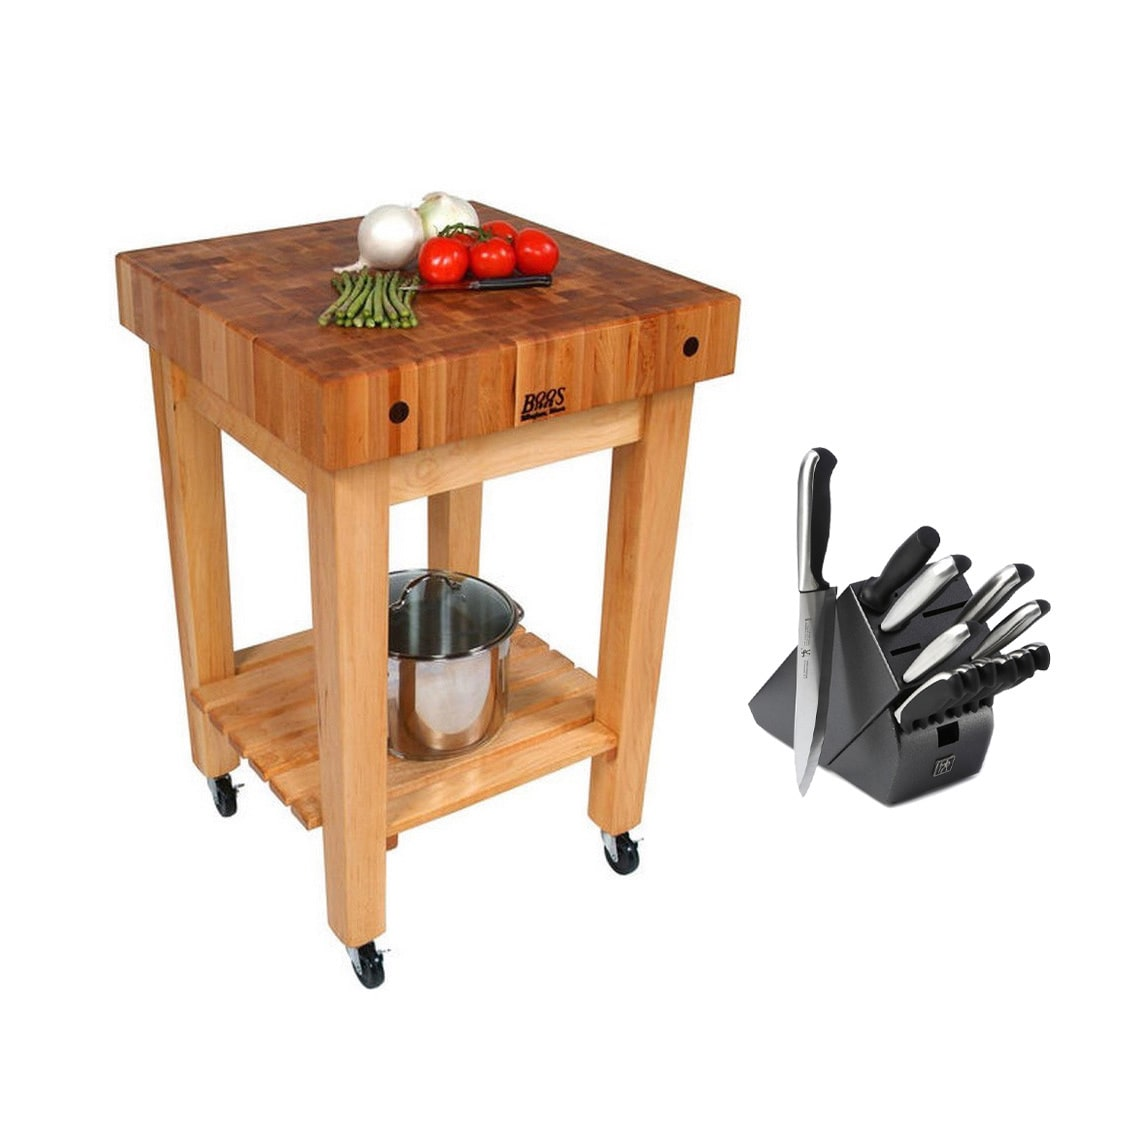 John Boos Maple Butcher Block 24 X 24 Kitchen Cart GB C And Henckels 13